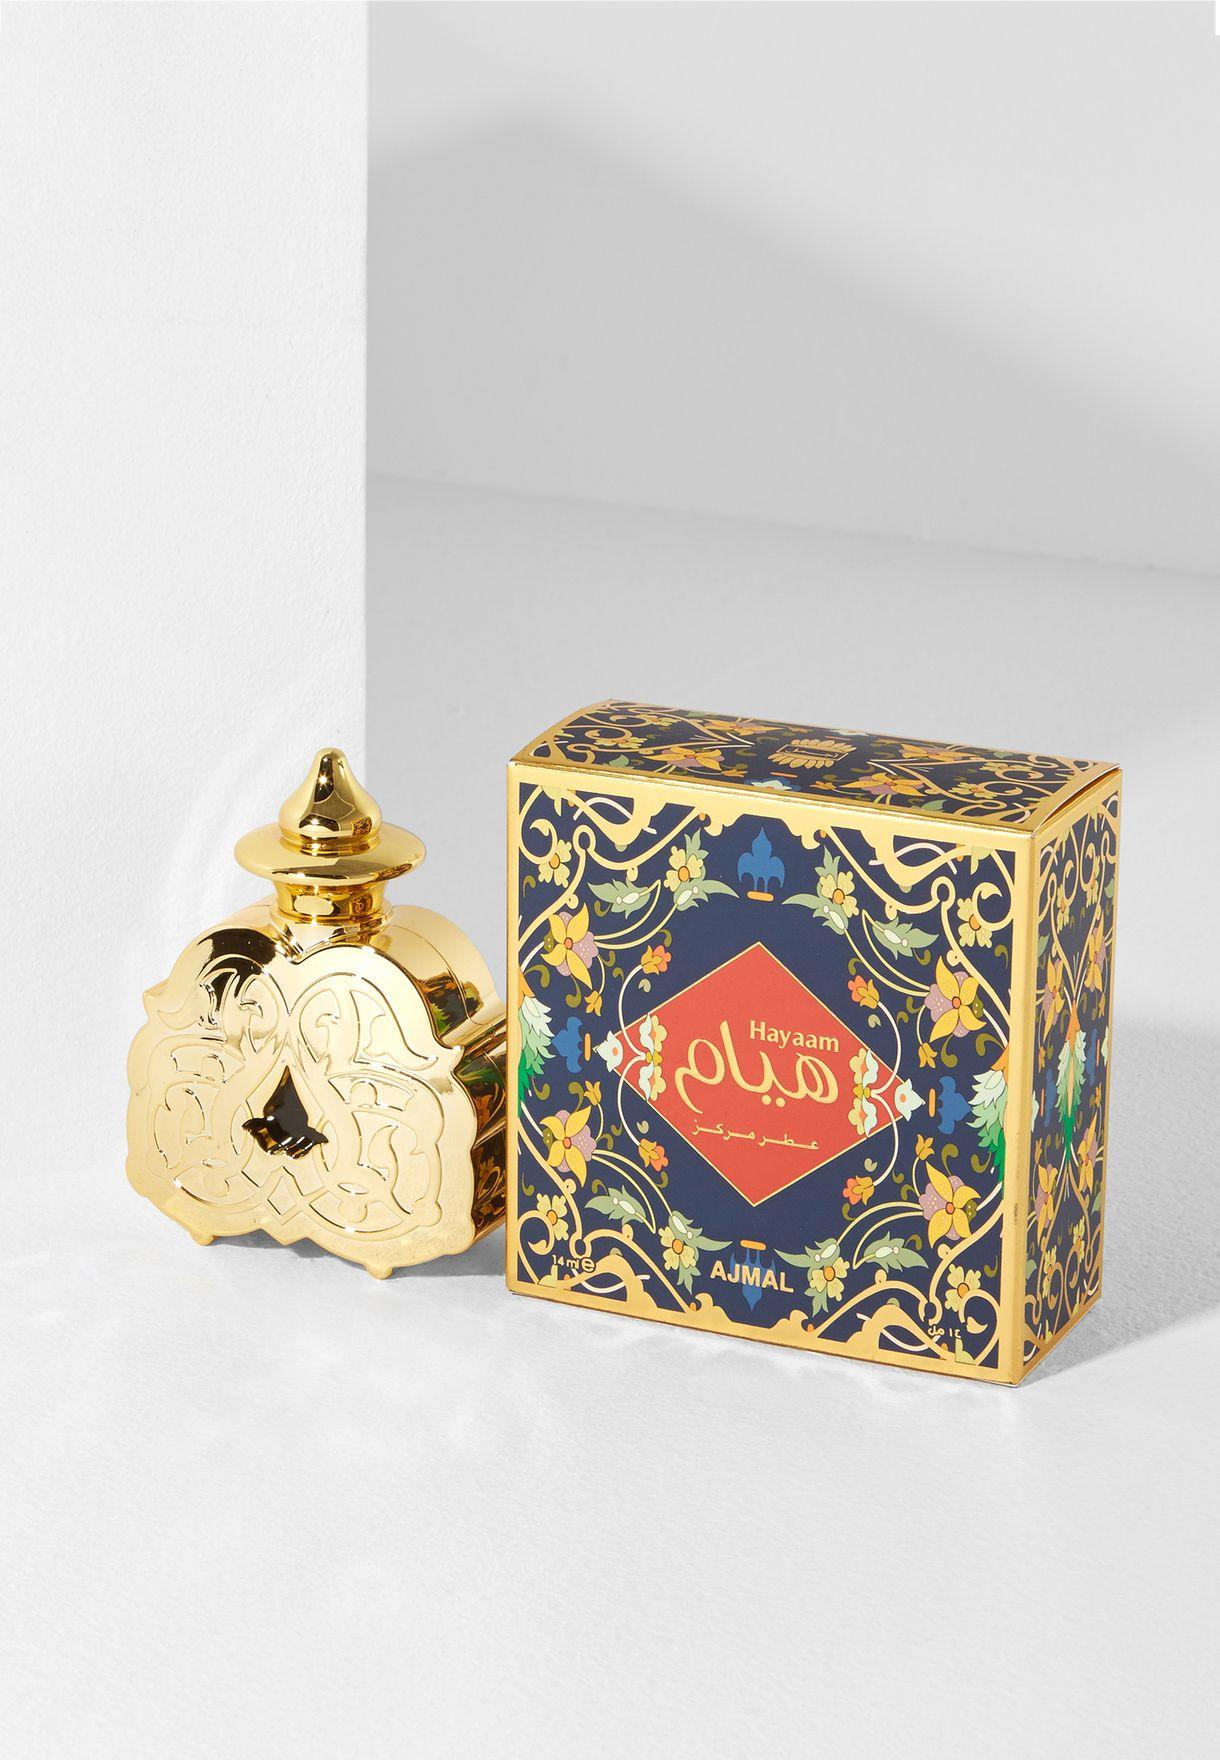 Hayaam Perfume Oil